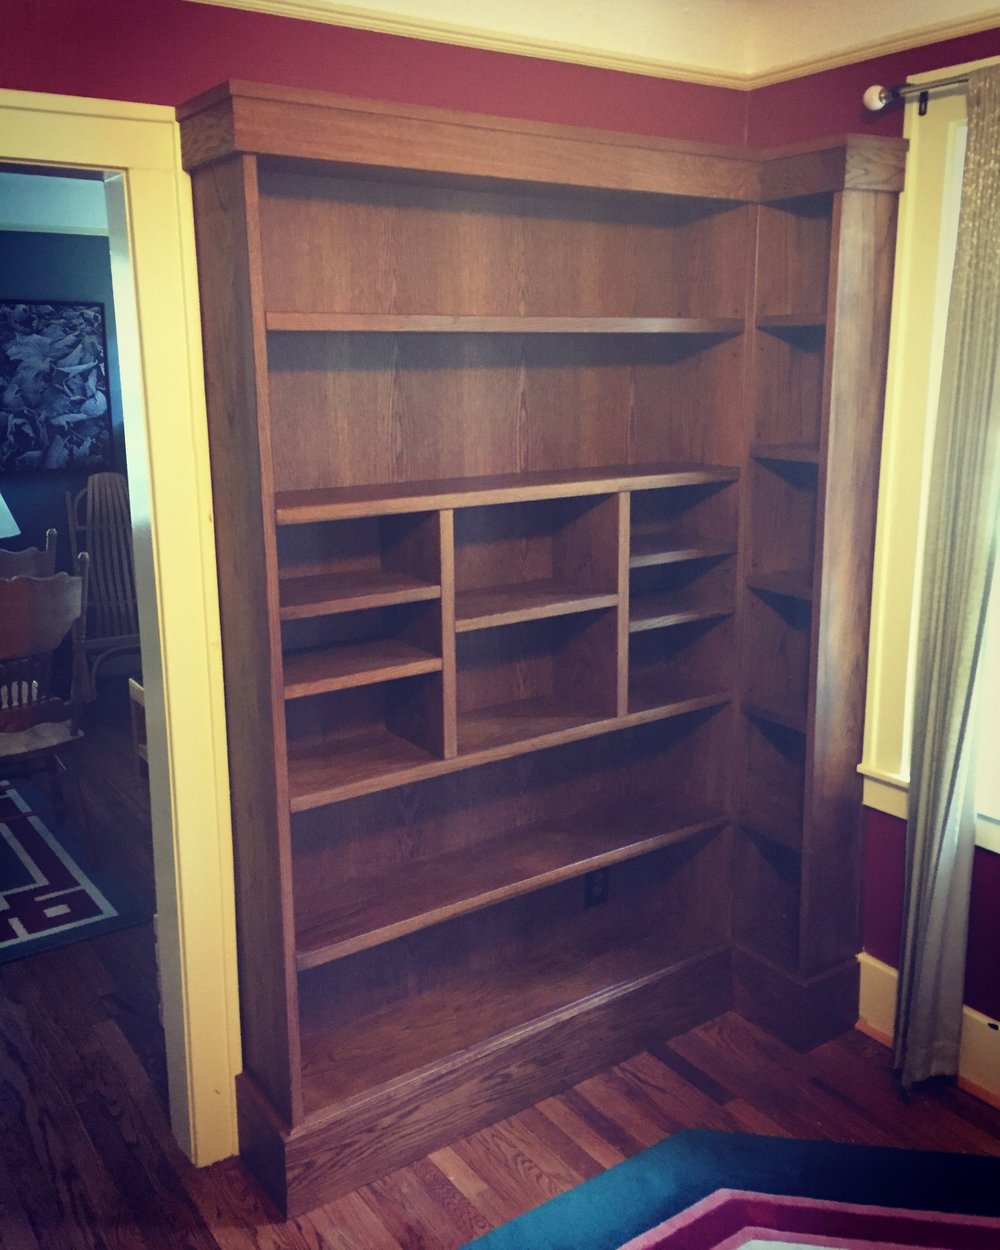 Completed white oak bookshelves installed. Pleasant Ridge, MI